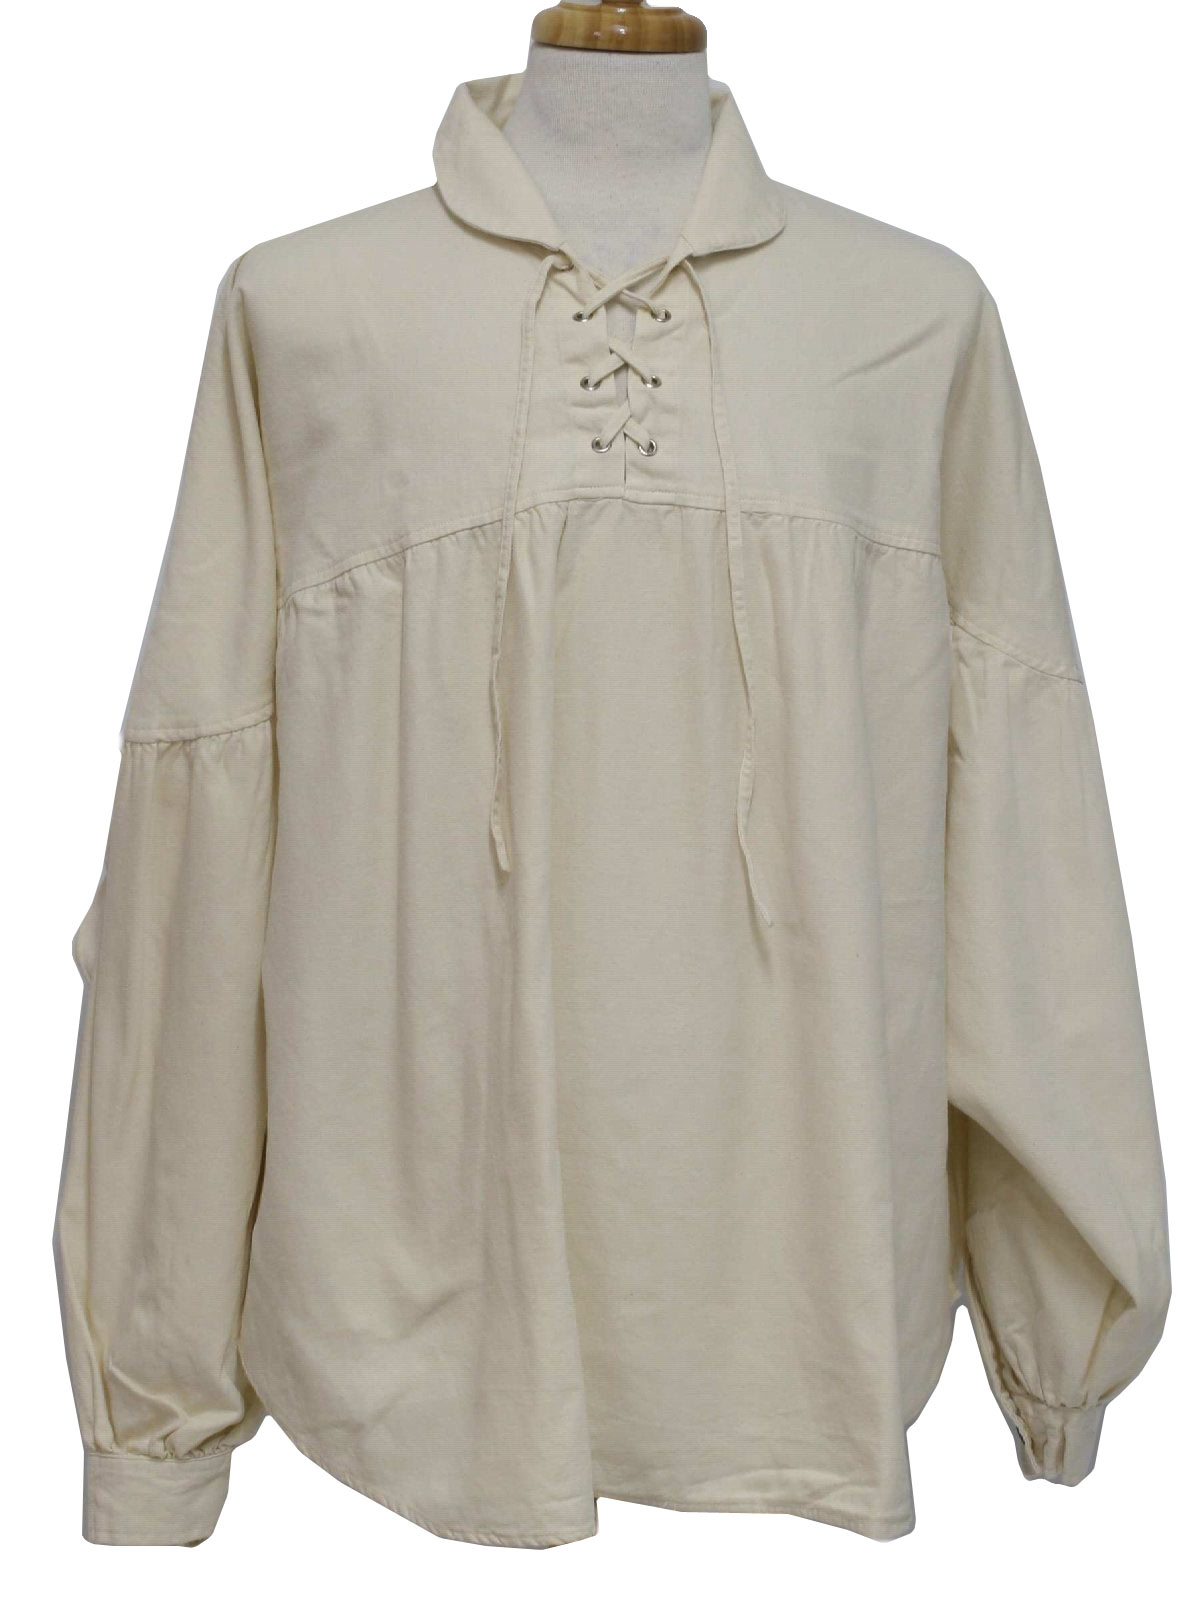 vintage venezia seventies hippie shirt 70s style made